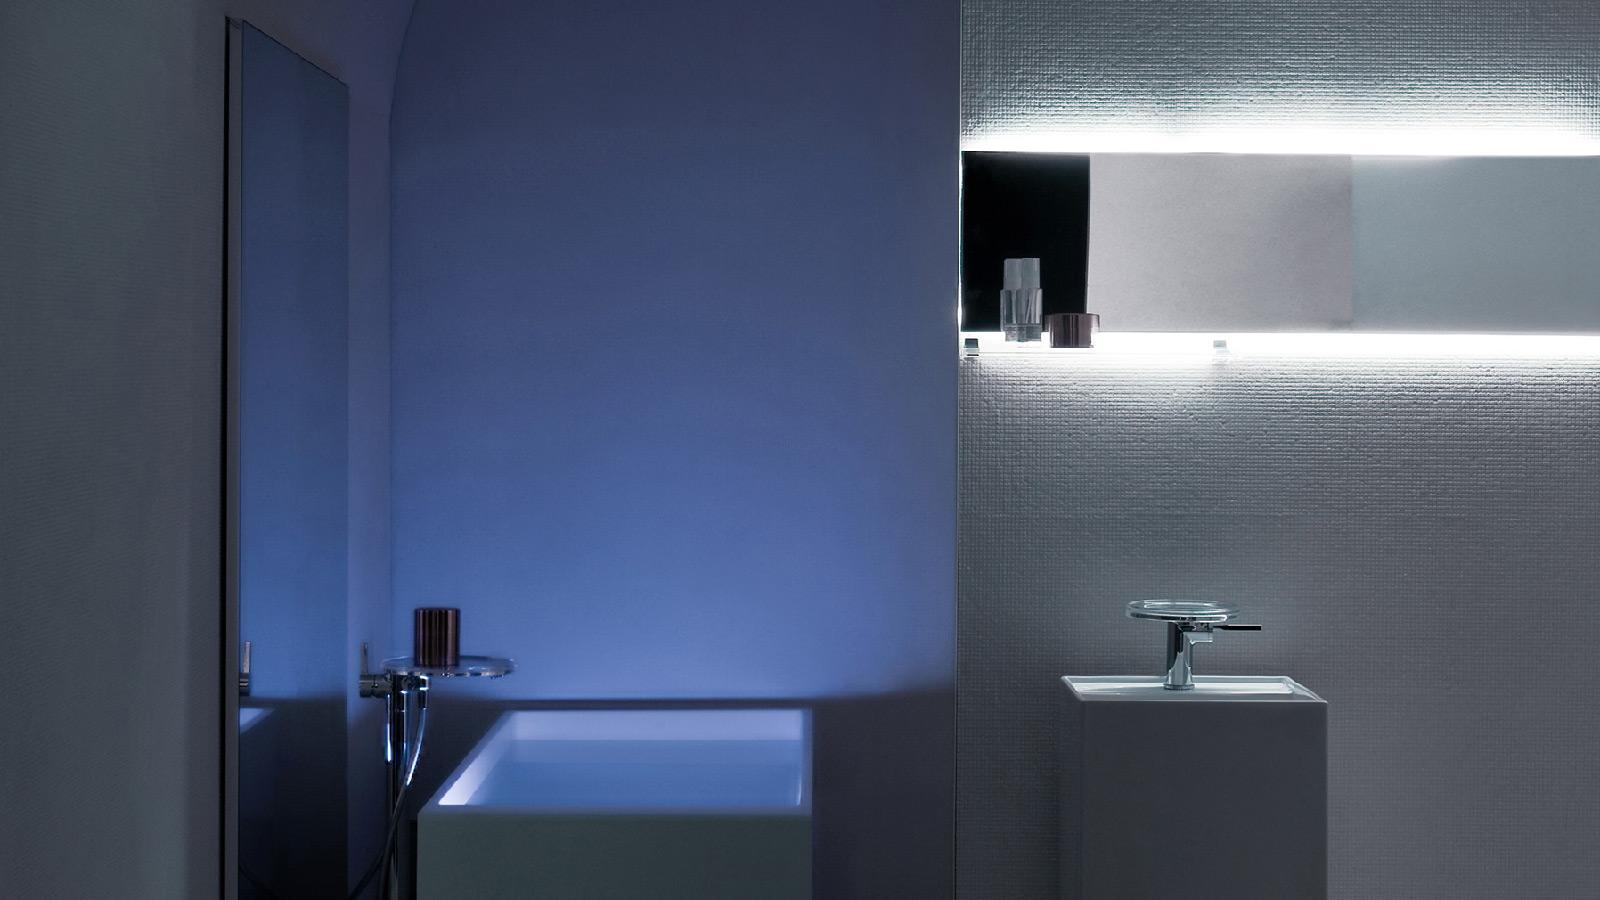 Badkamer Showroom Katwijk : Showroom sani badkamers